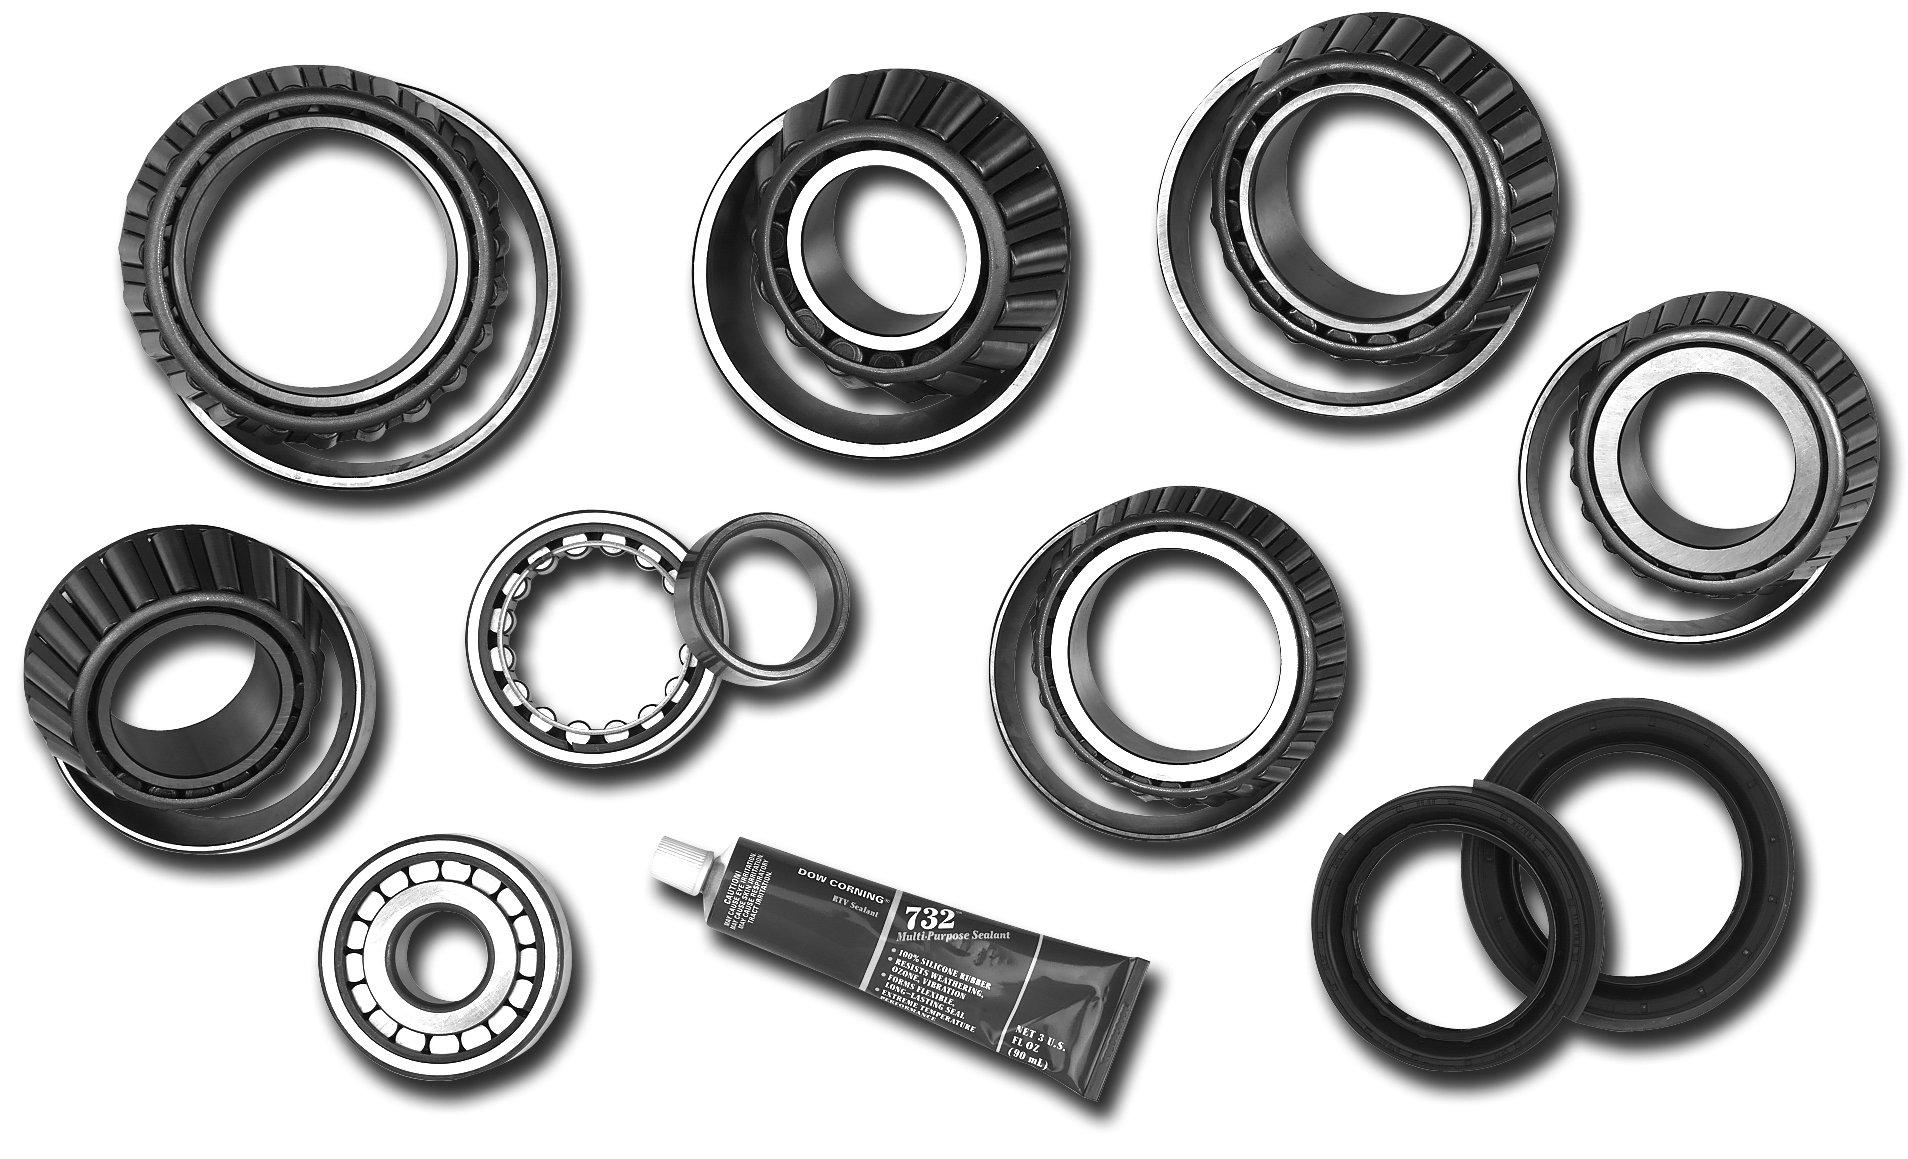 Dana Spicer 2017086 Axle Bearing Rebuild Kit for 07-11